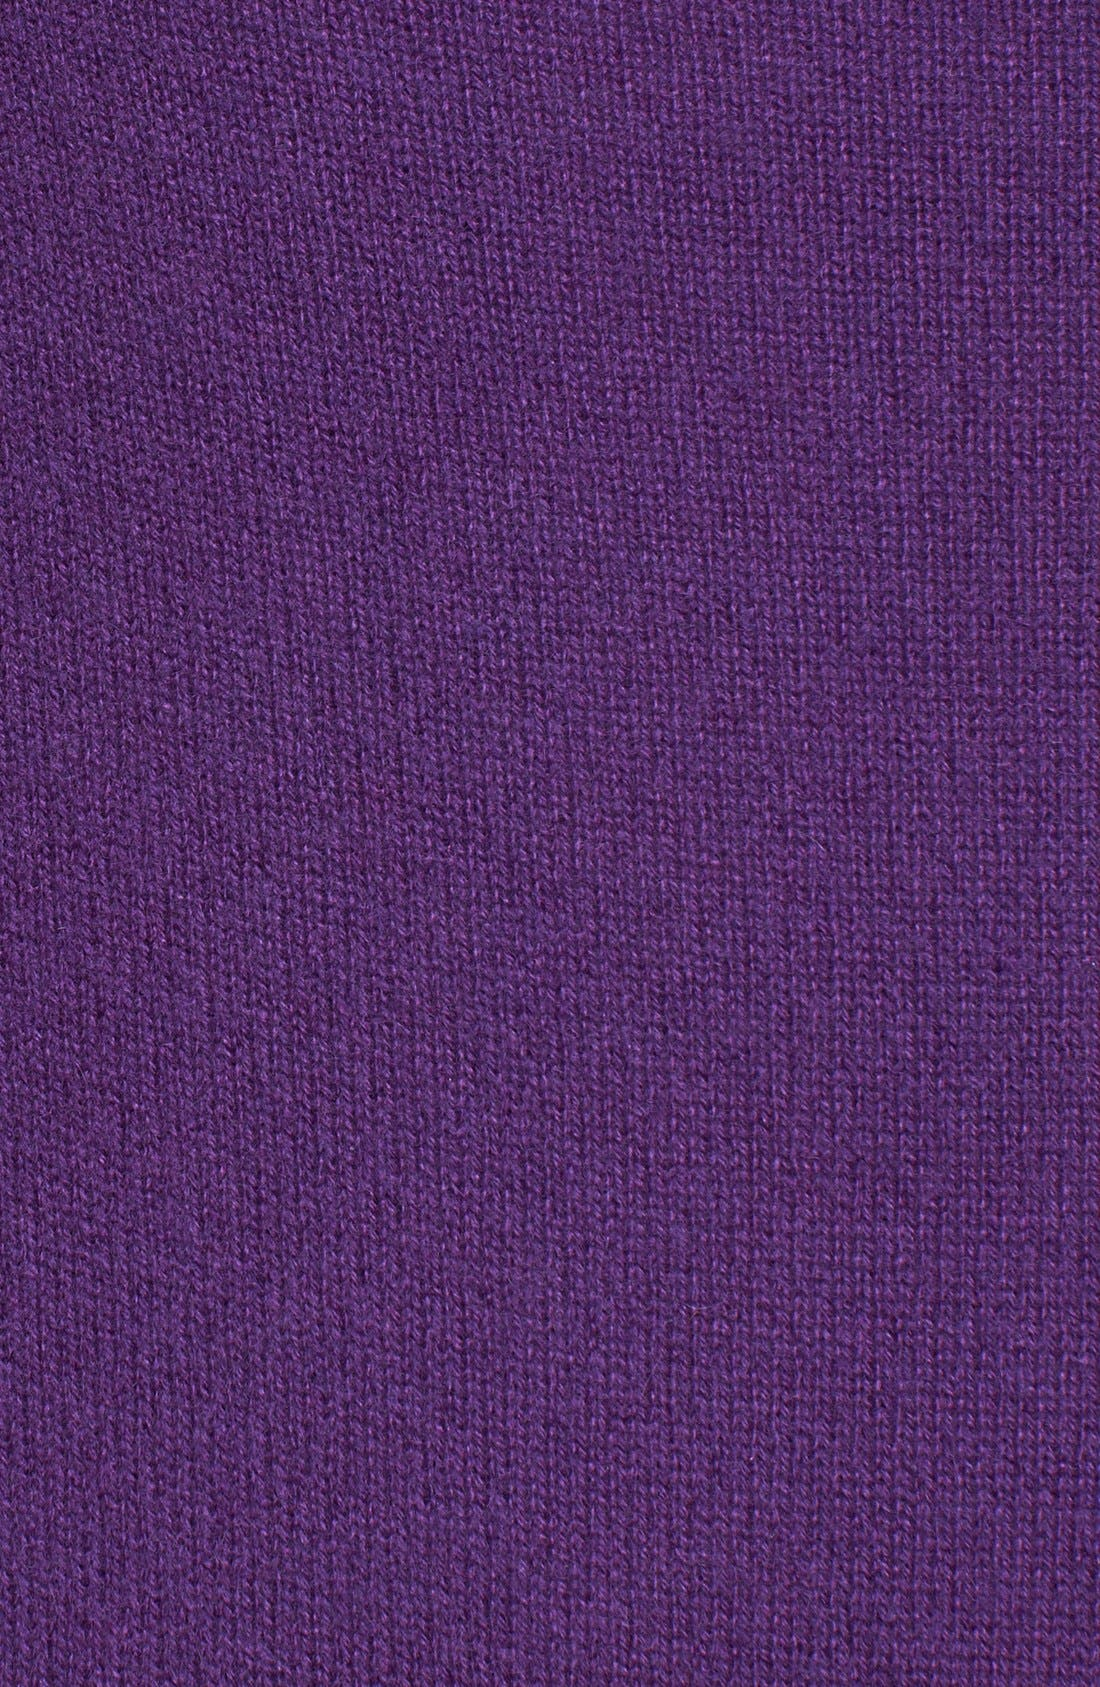 Alternate Image 3  - Halogen® Raglan Sleeve Cashmere Sweater (Petite)